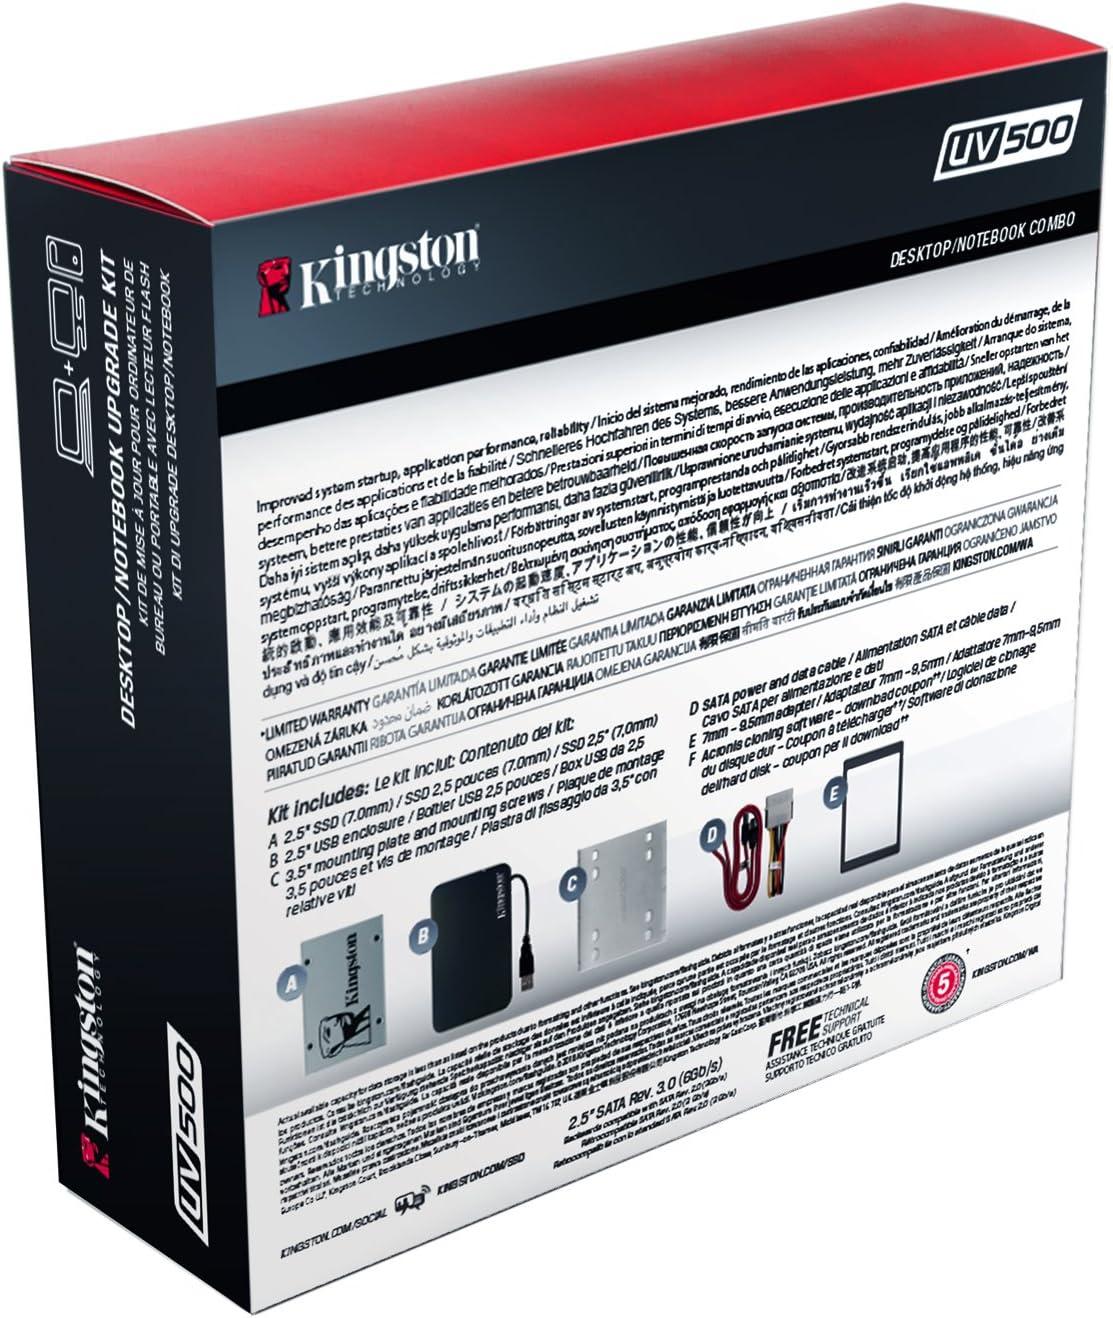 Kingston SUV500B/240G - Unidad de Disco Duro SSD 240 GB, con Kit ...